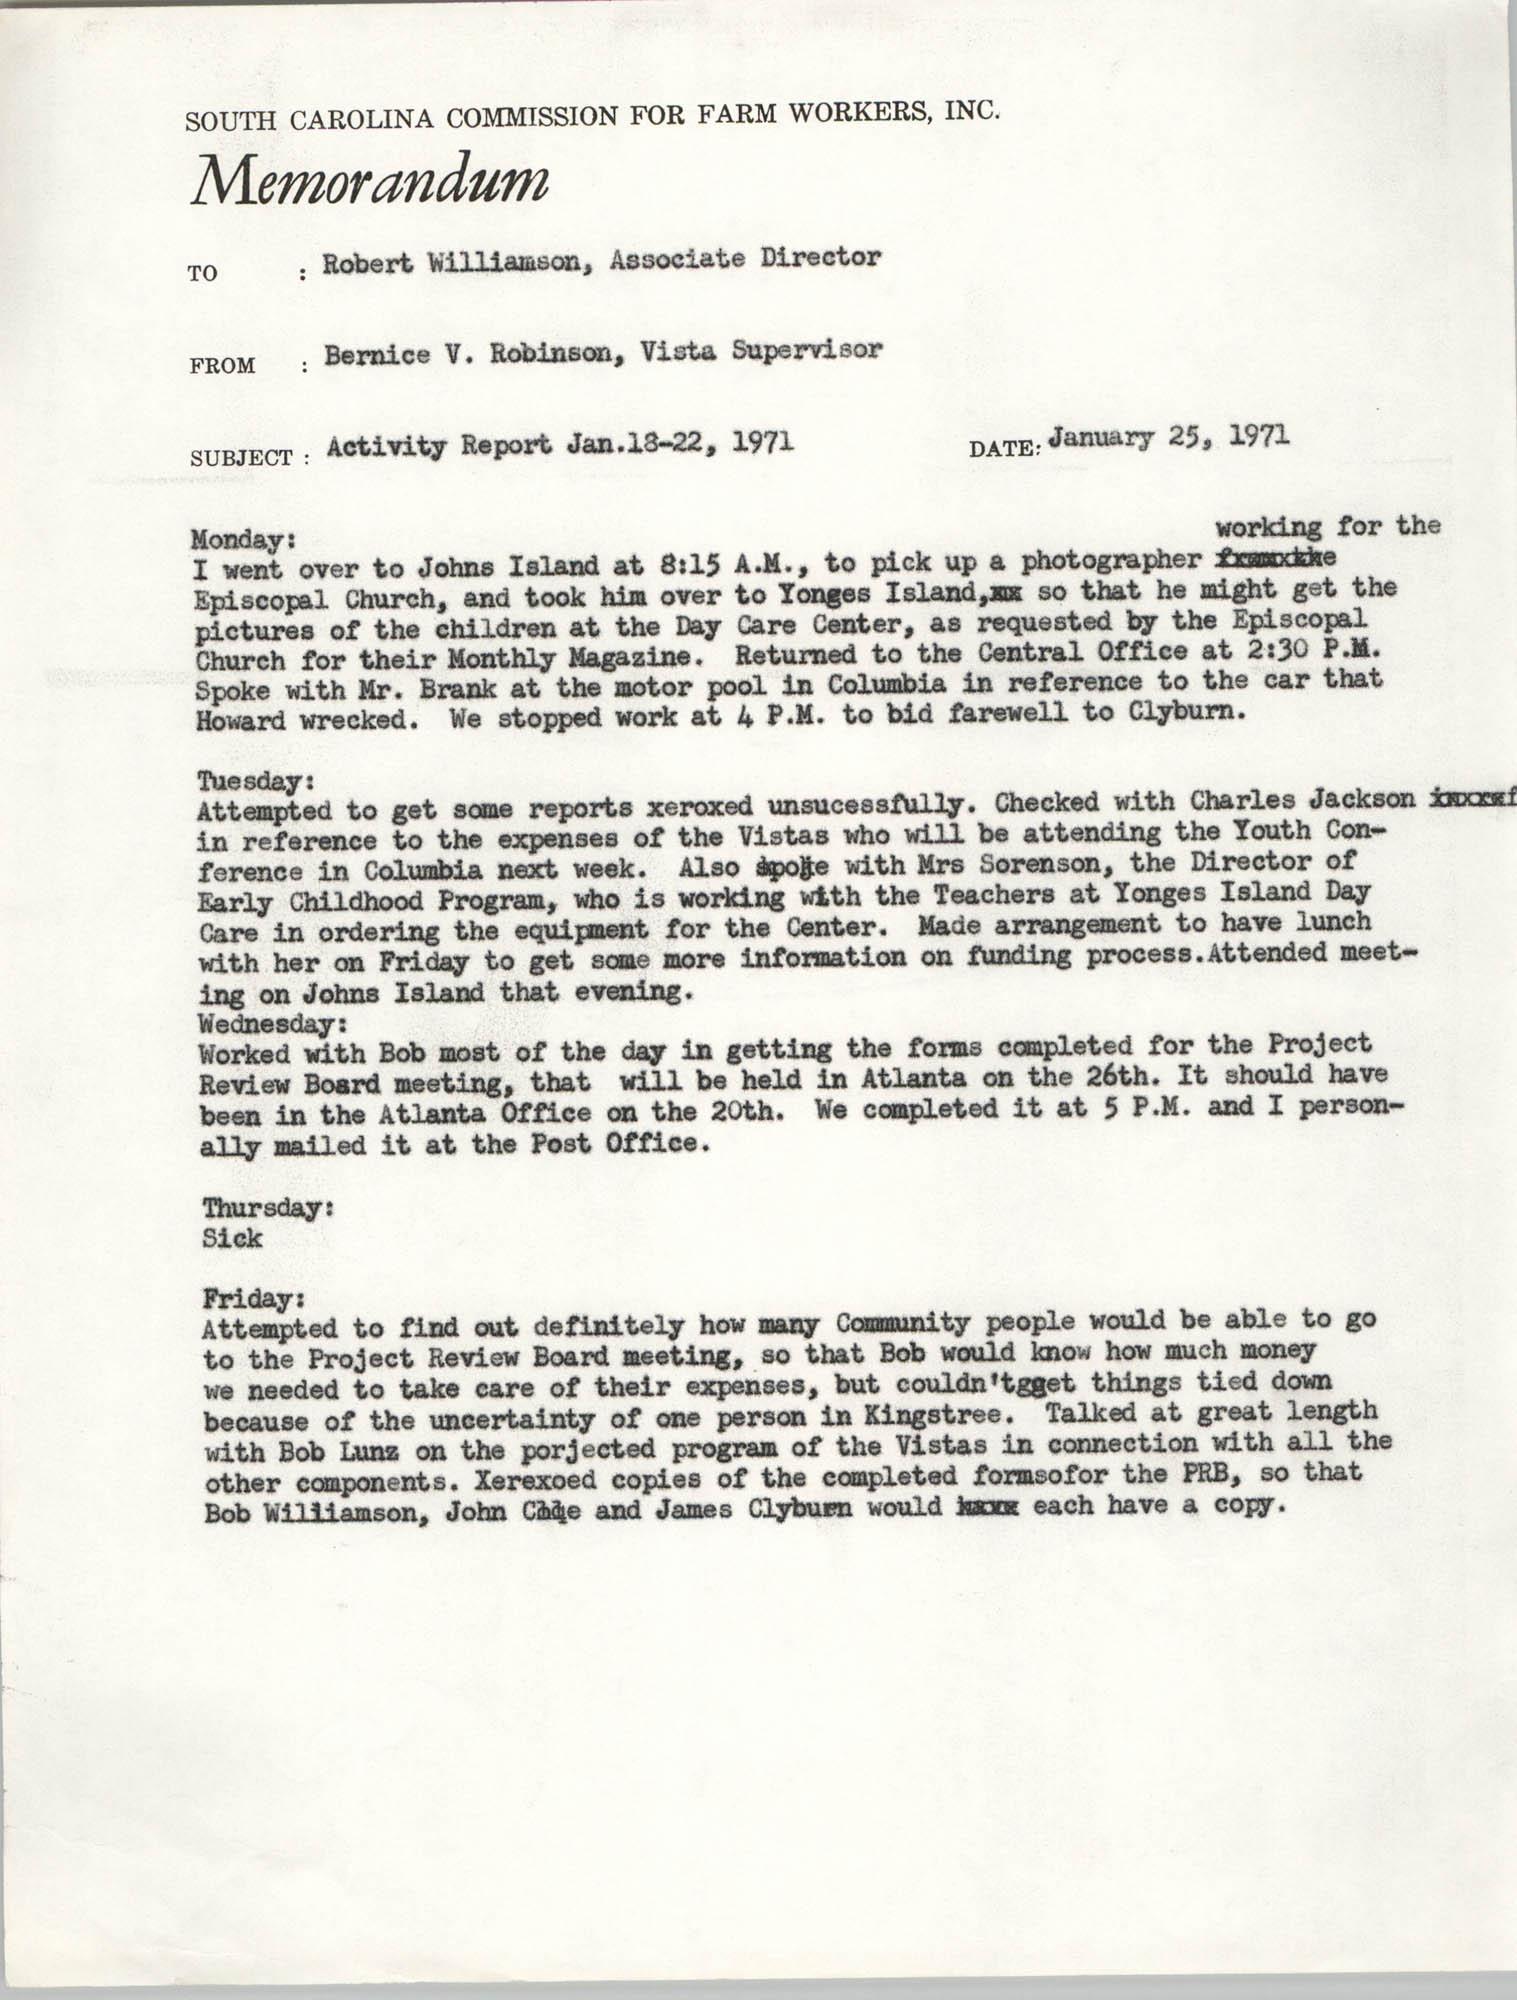 Memorandum from Bernice V. Robinson to Robert Williamson, January 25, 1971